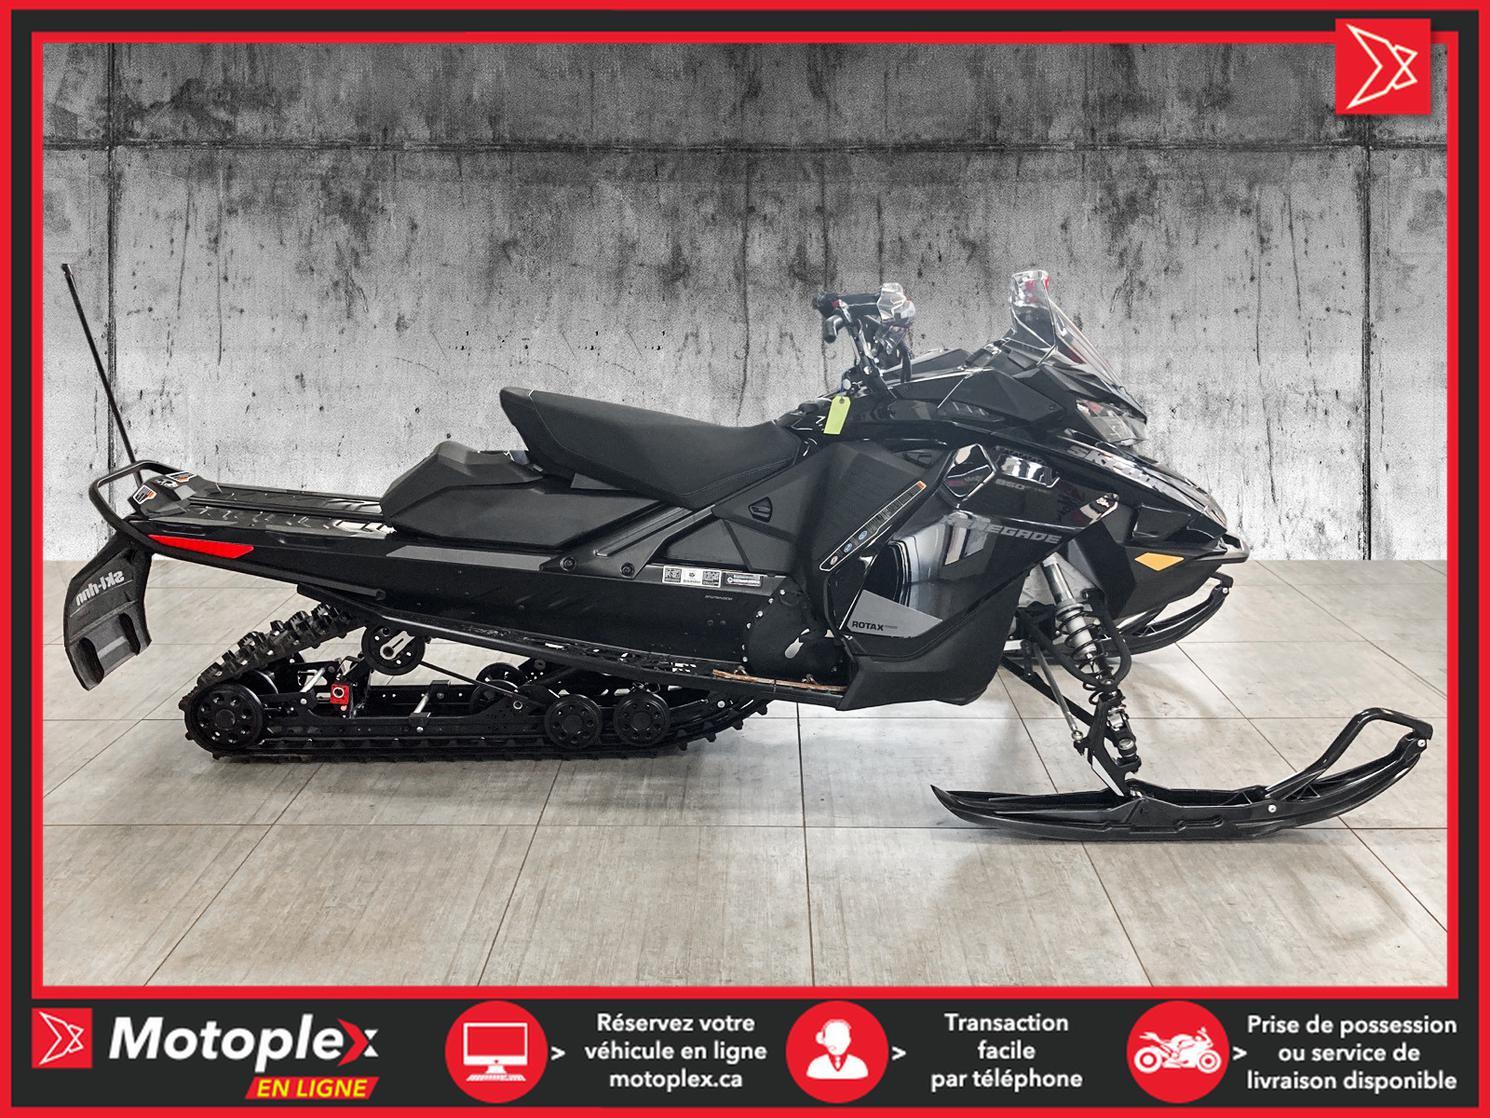 2021 Ski-Doo RENEGADE ADRENALINE 850 E-TEC 52$/SEMAINE